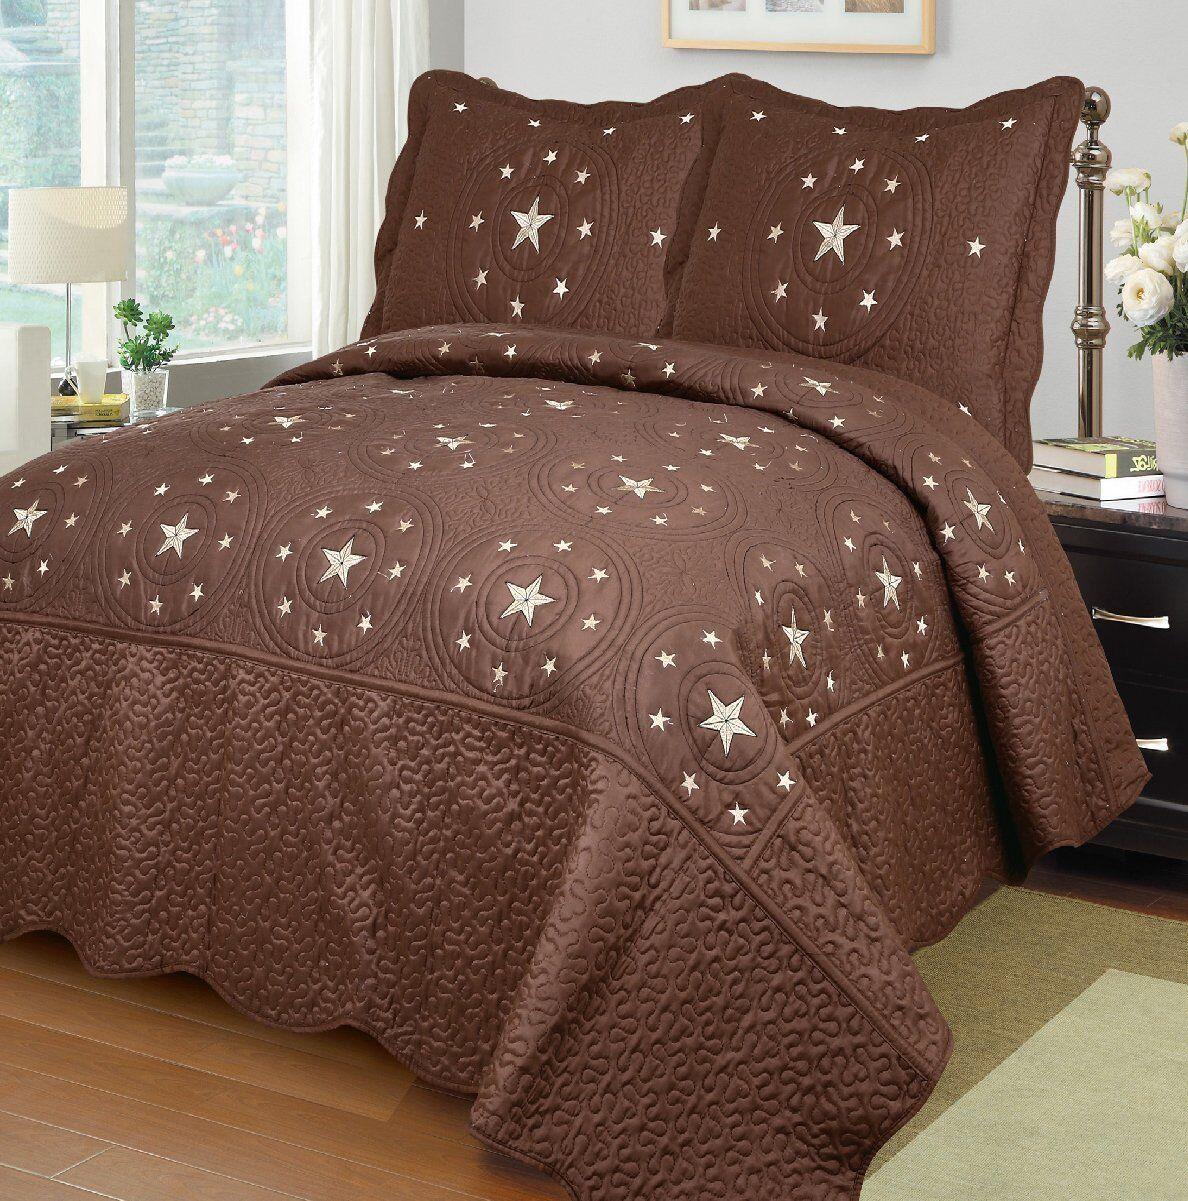 Fancy Linen 3pc braun Texas Star Bedspread Quilt Set Embroidery All Größes New